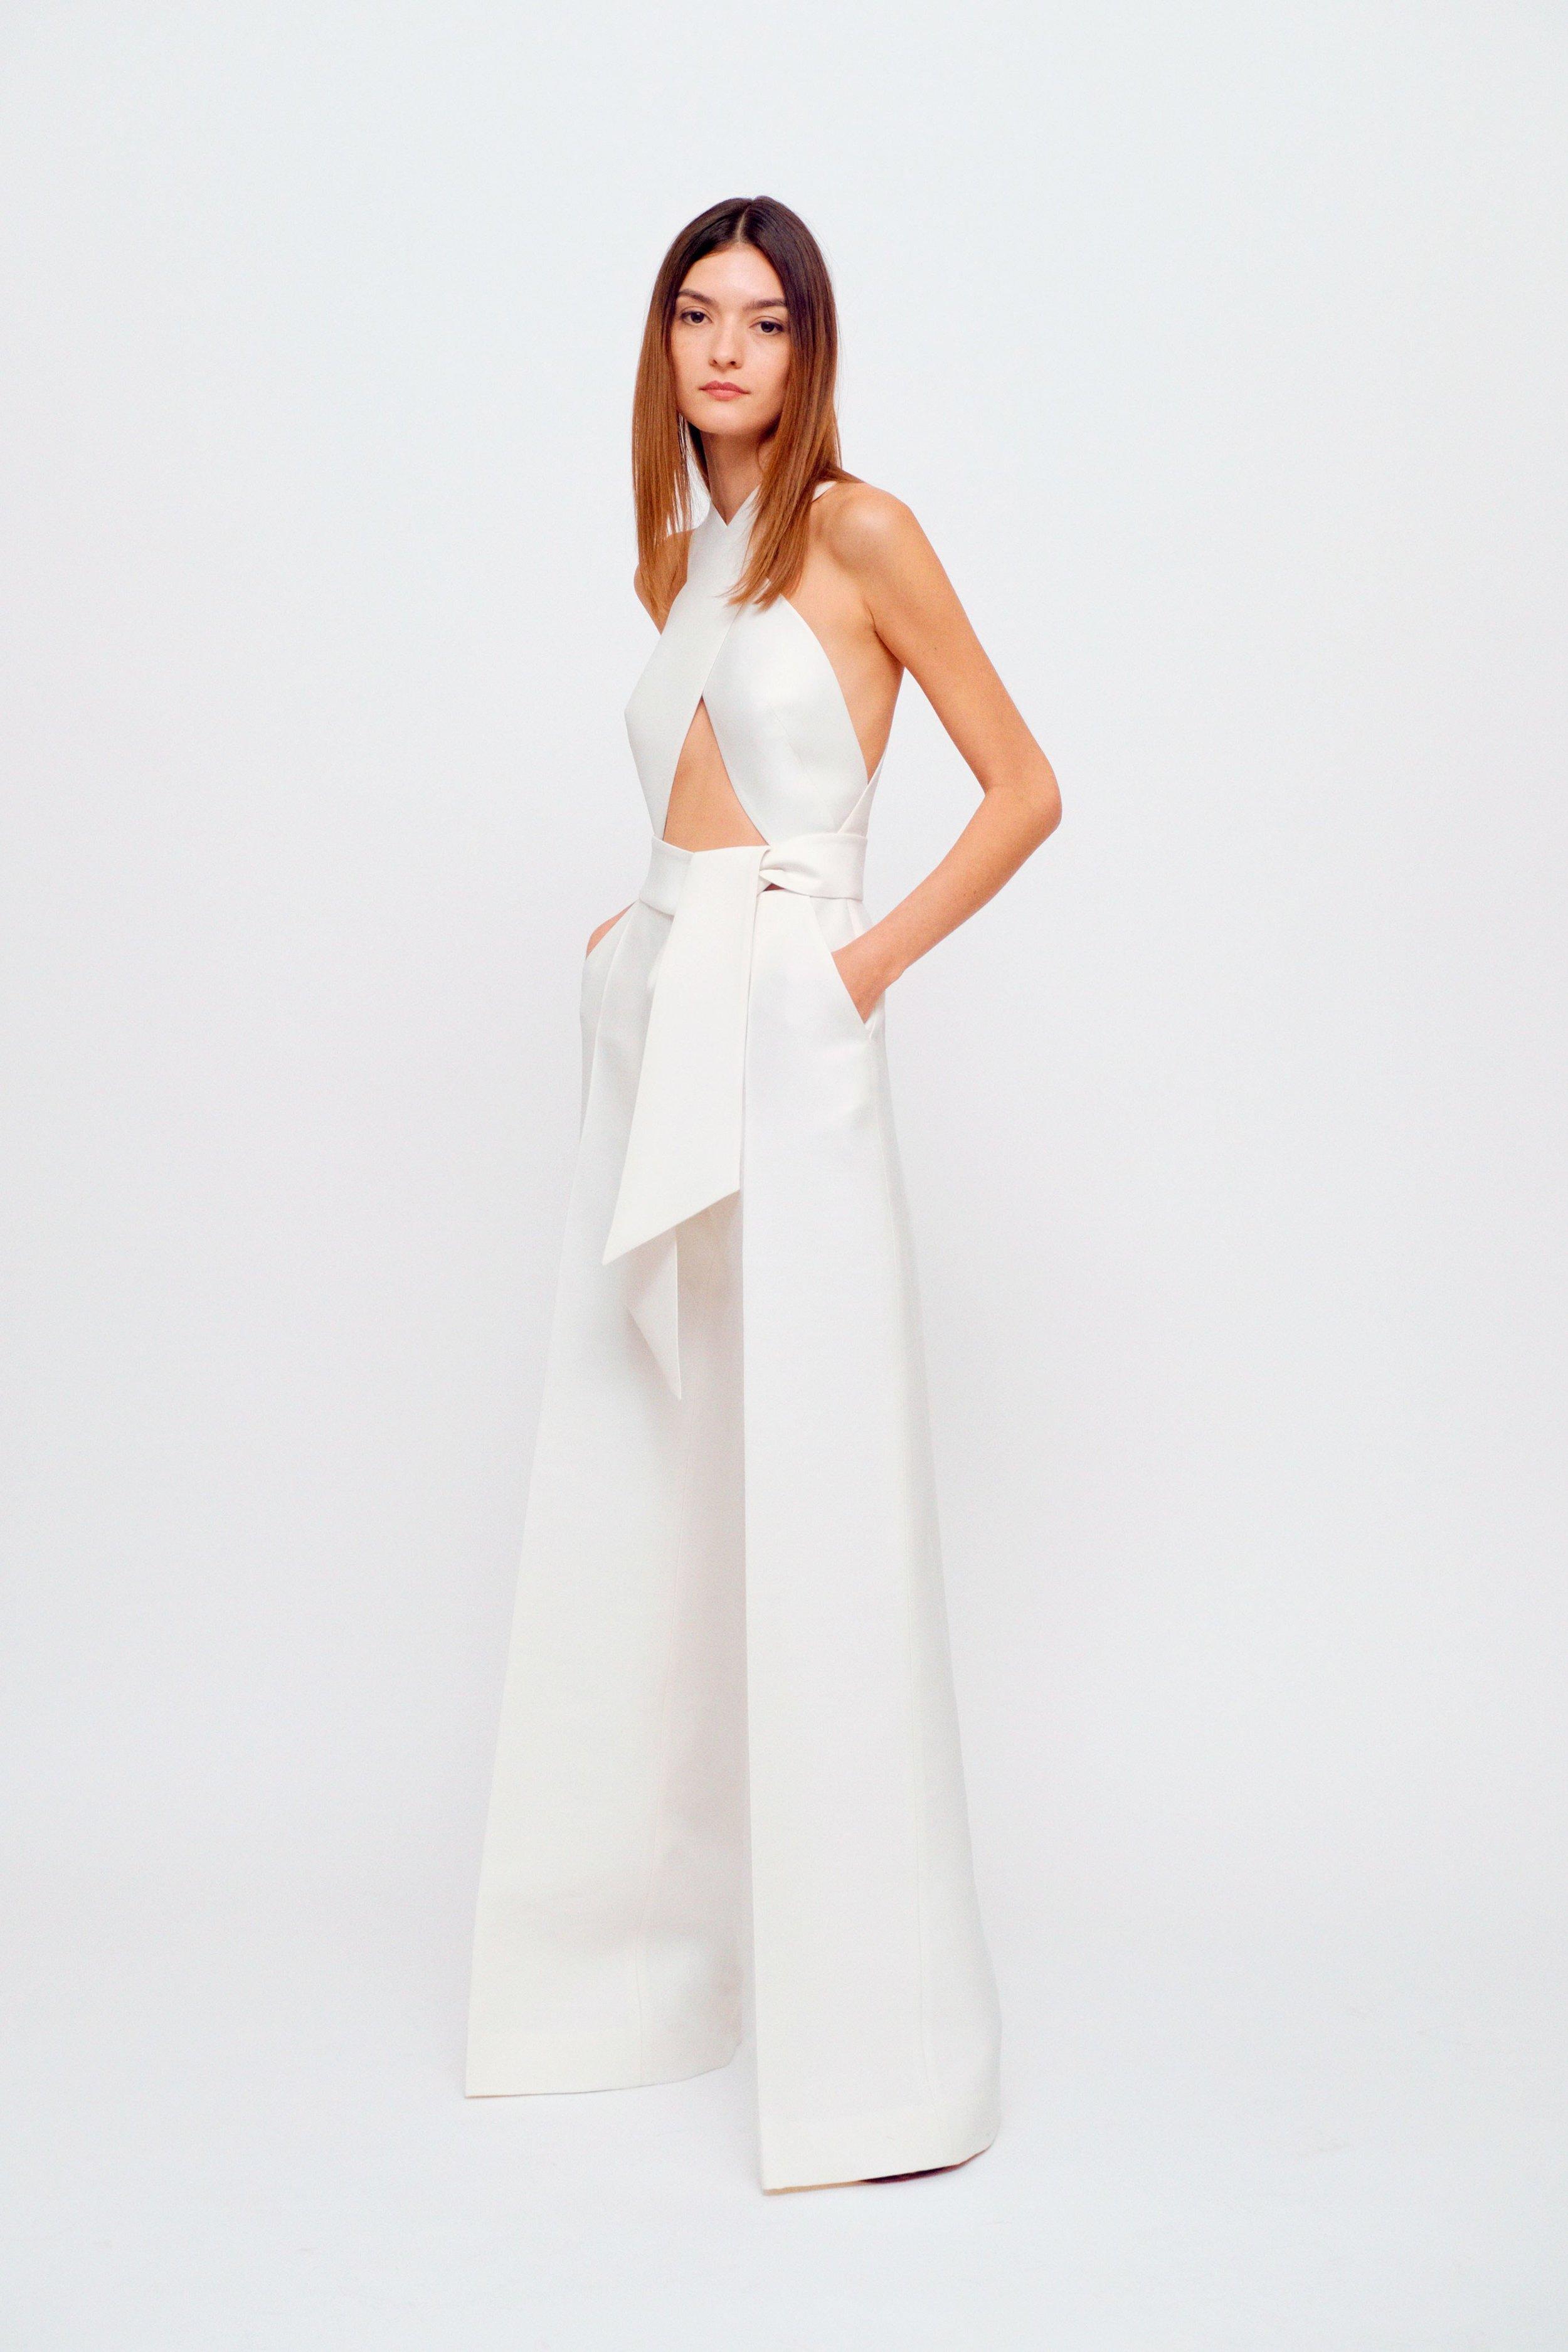 00016-martin-grant-spring-2019-ready-to-wear-credit-daniel-roché.jpg